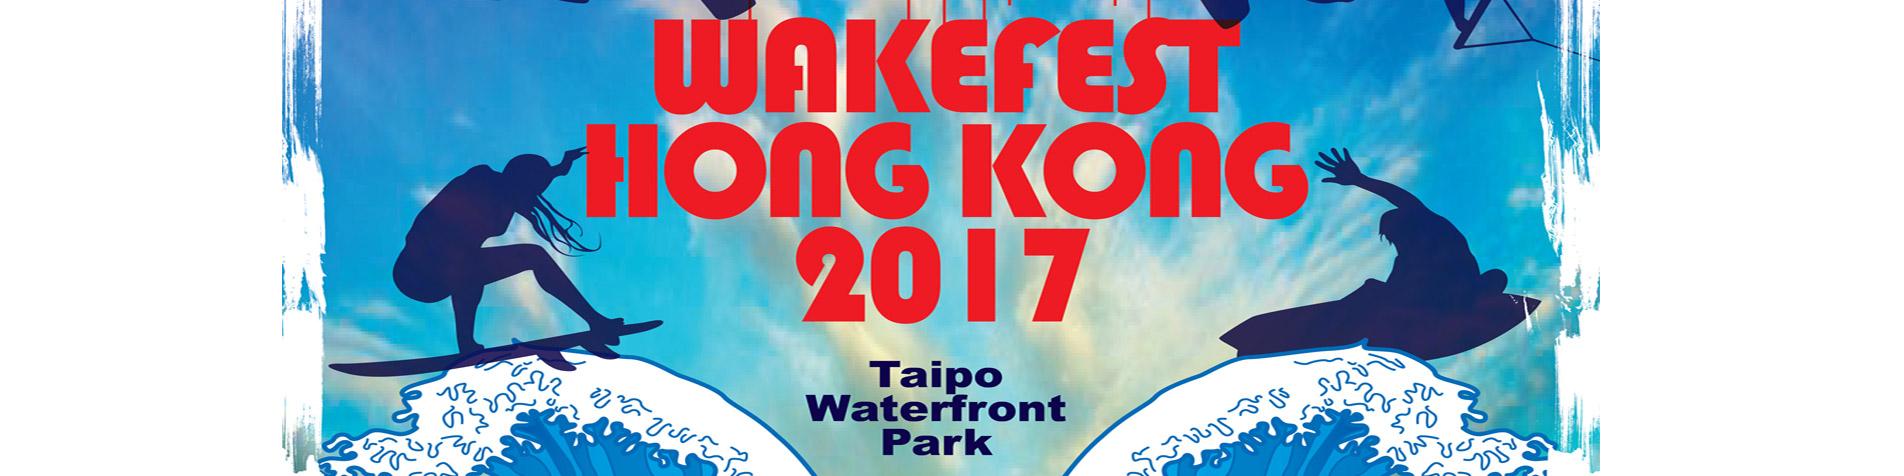 Nautique Wakefest Hong Kong 2017